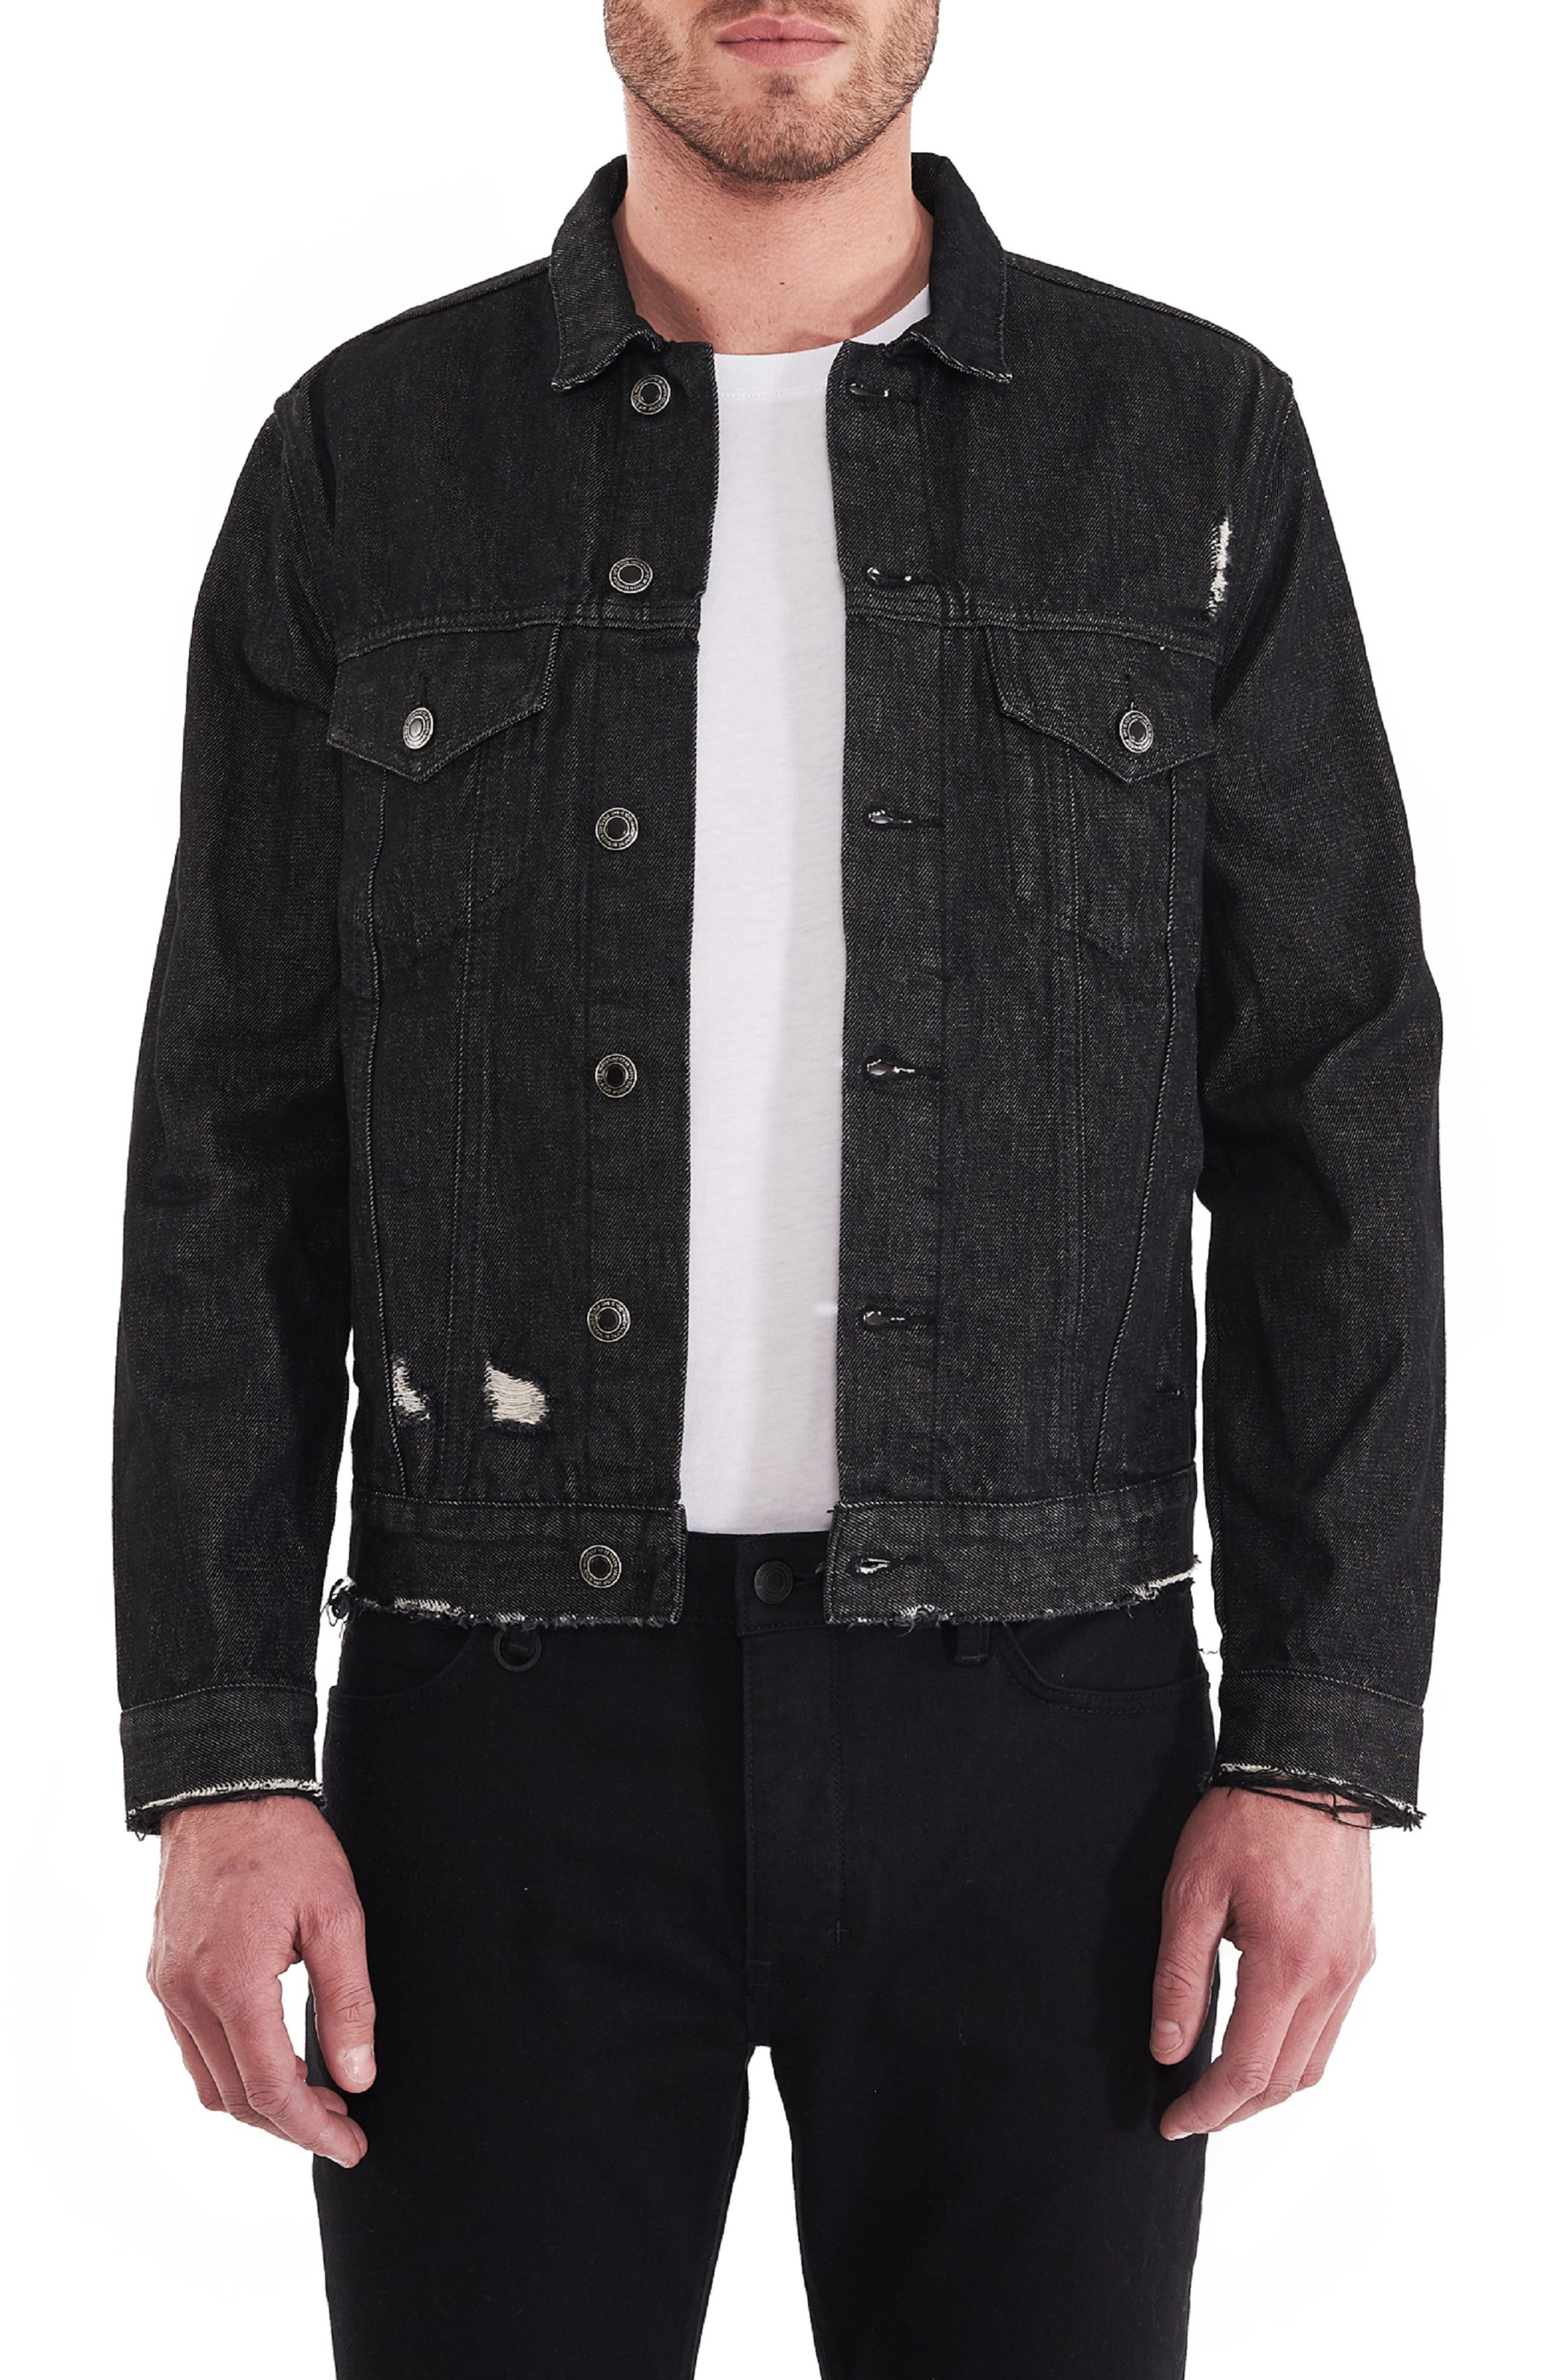 Type One Black Label Denim Jacket,                             Main thumbnail 1, color,                             BLACK LABEL